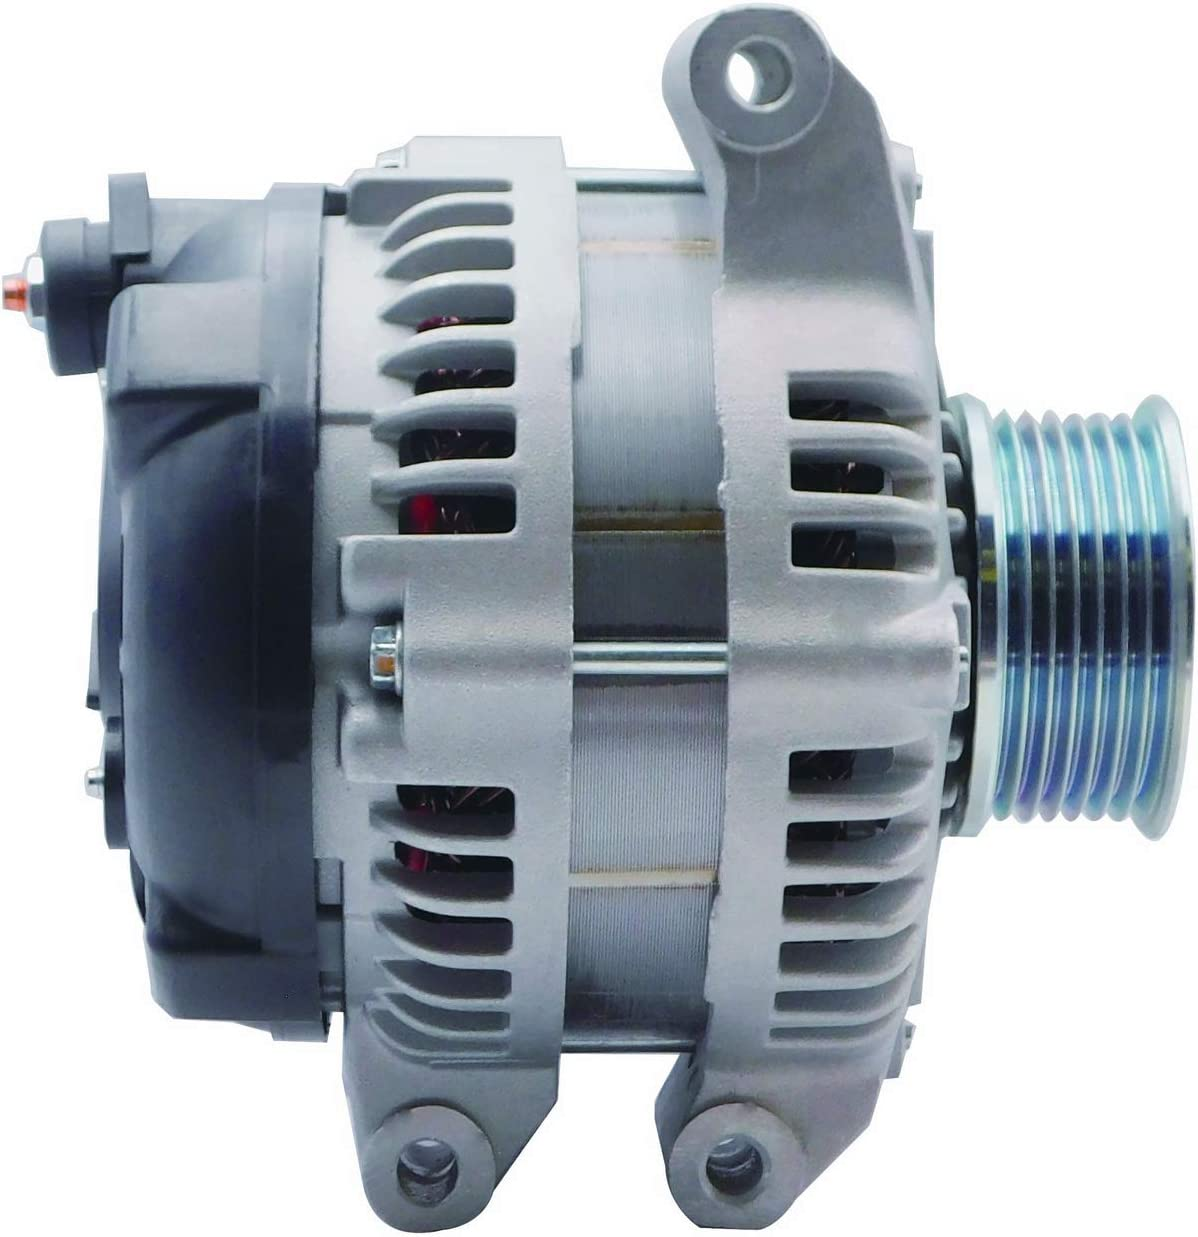 31100-RWC-A01 31100-RWC-A01RM 104210-5160 Base Sport /& SH-AWD Sport 4 Door New Alternator For Acura RDX Sport Utility 2.3L DOHC Turbocharged 2007-2012